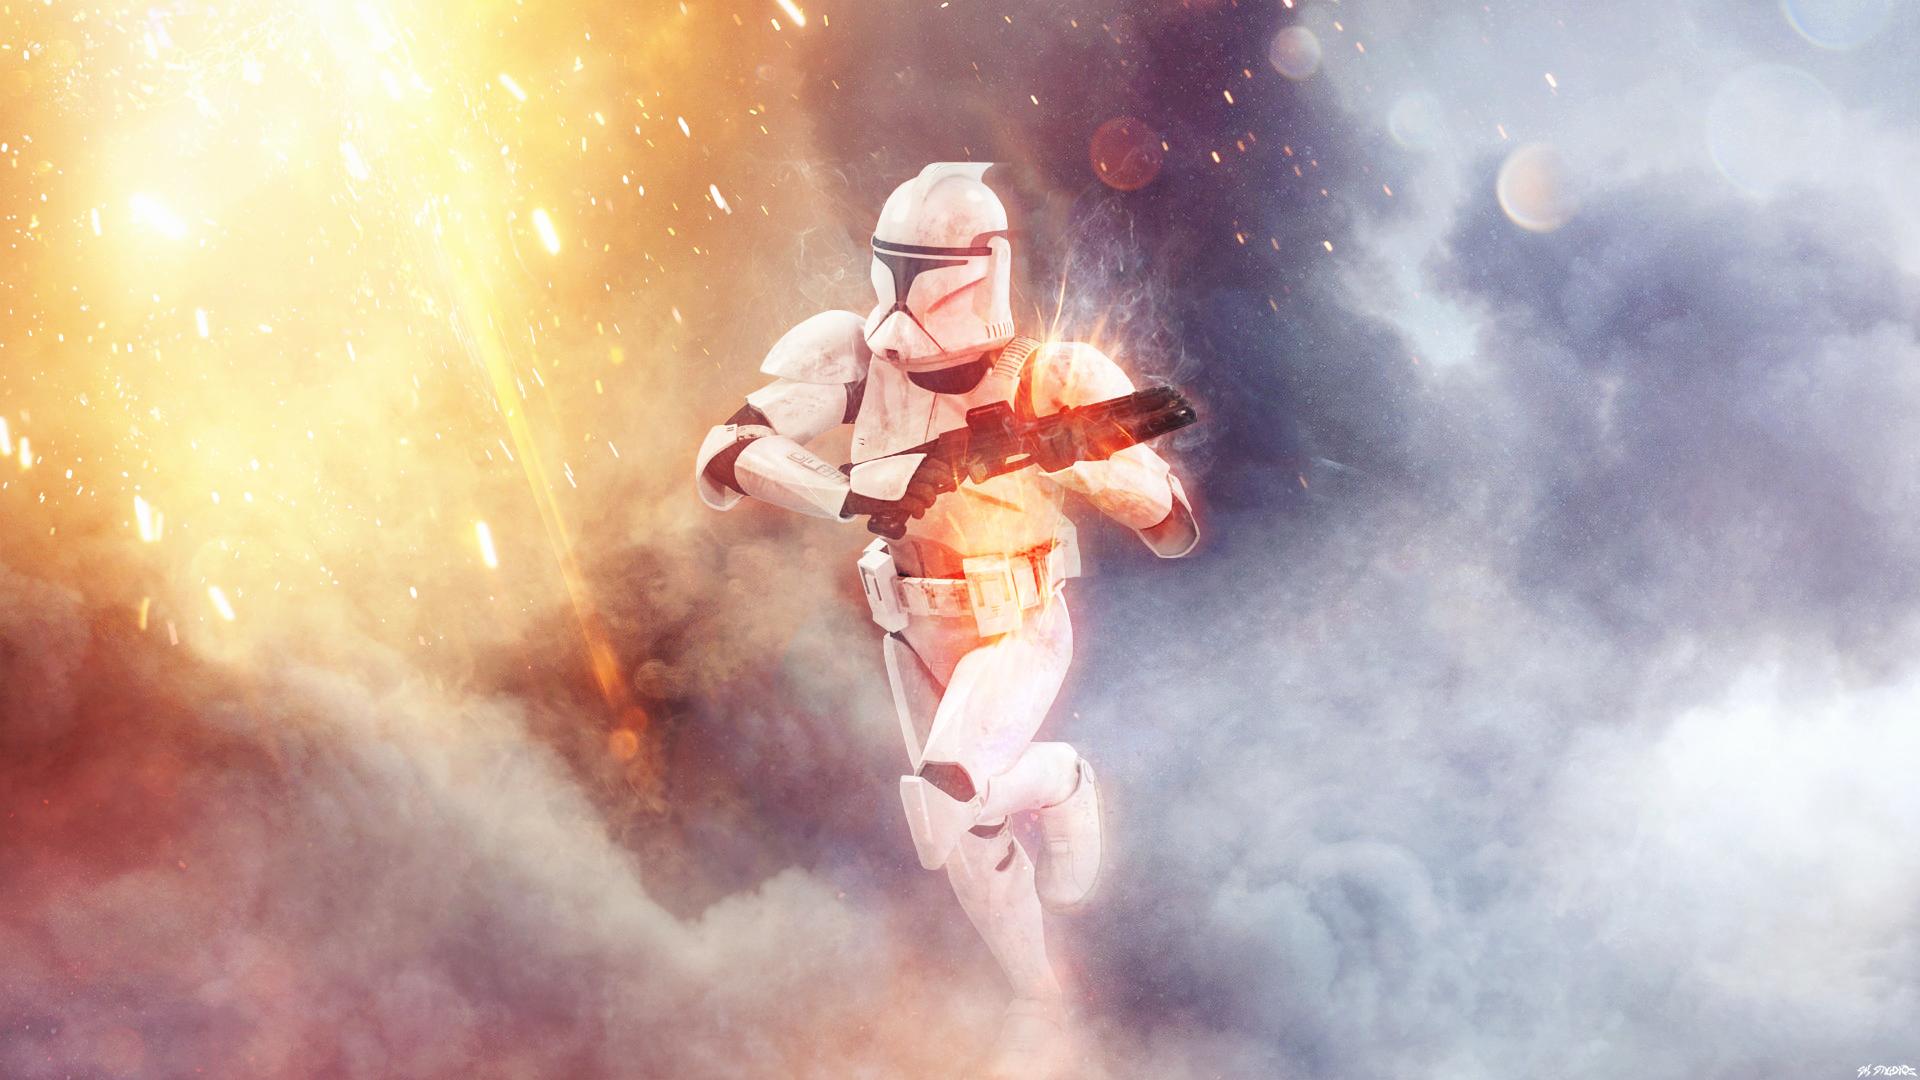 Pin By Sergio Vale On Star Wars Clone Trooper Star Wars Stormtrooper Widescreen Wallpaper